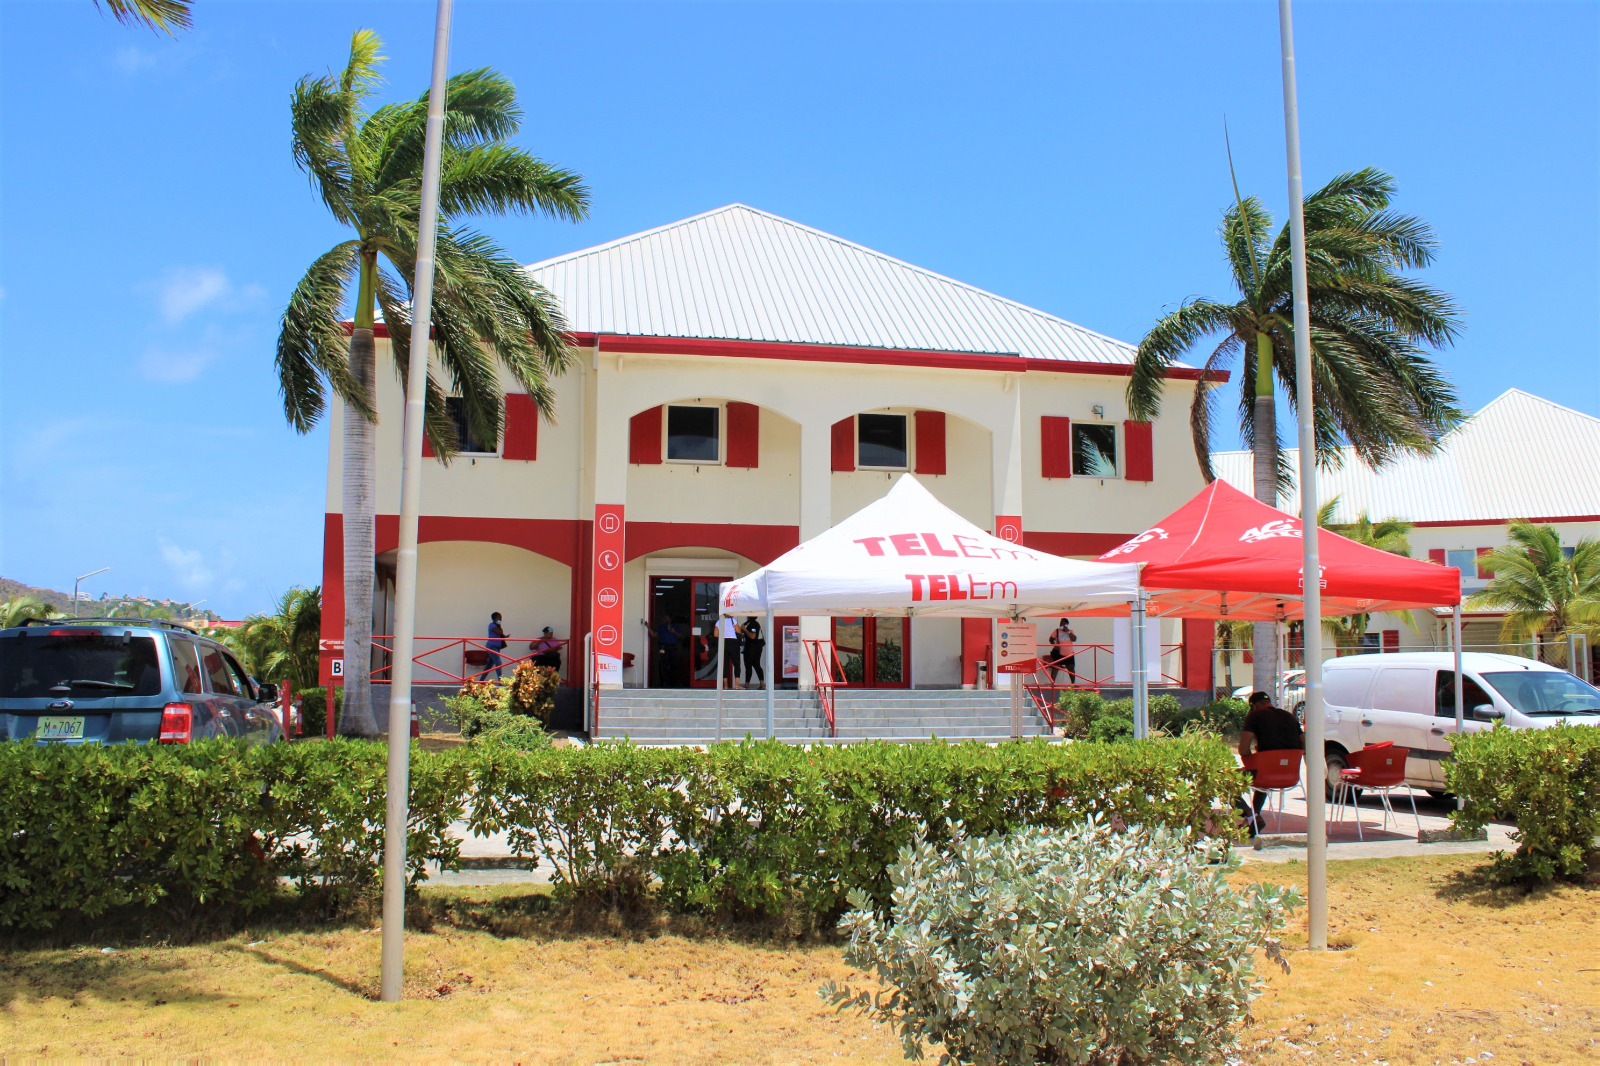 Telem Main Office building - Pond Island